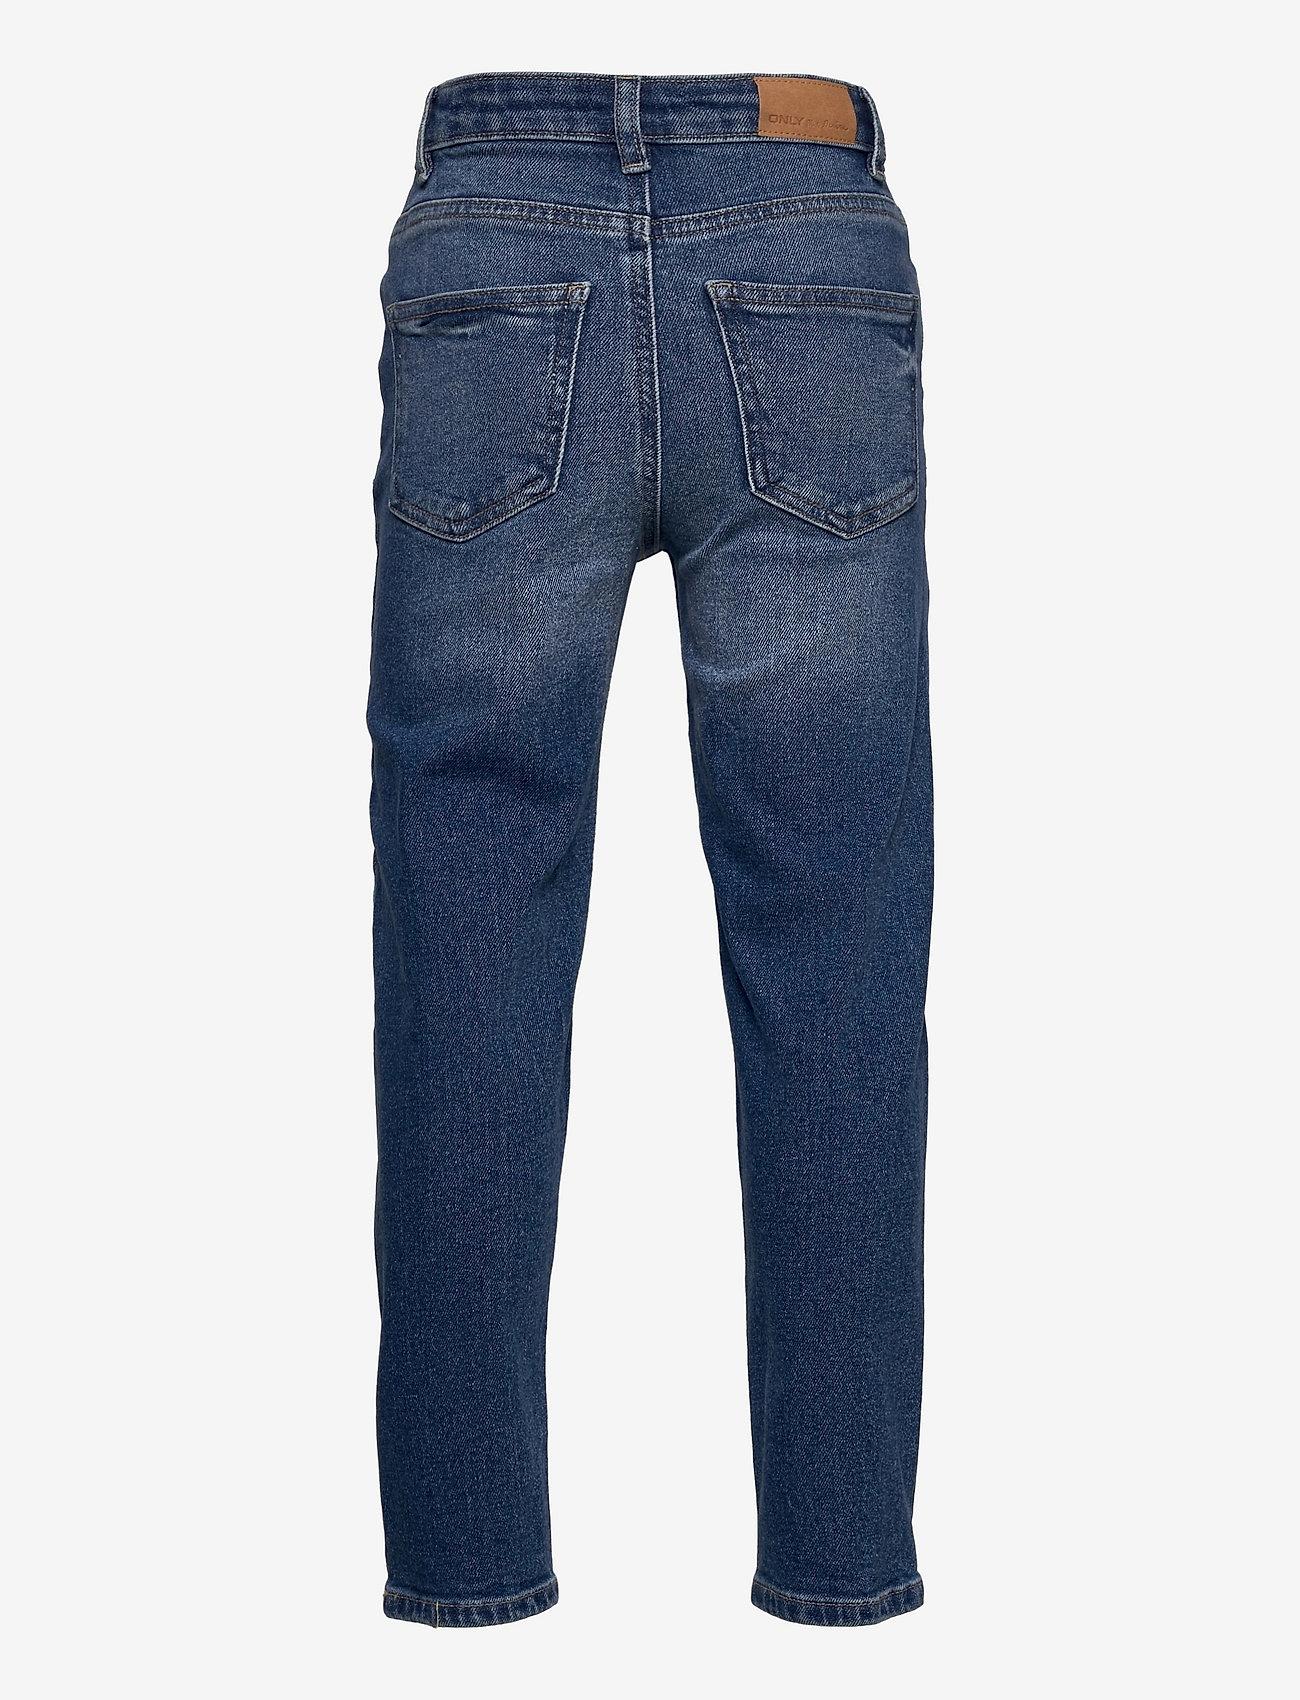 Kids Only - KONCALLA LIFE MOM FIT DNM AZG159 - jeans - medium blue denim - 1